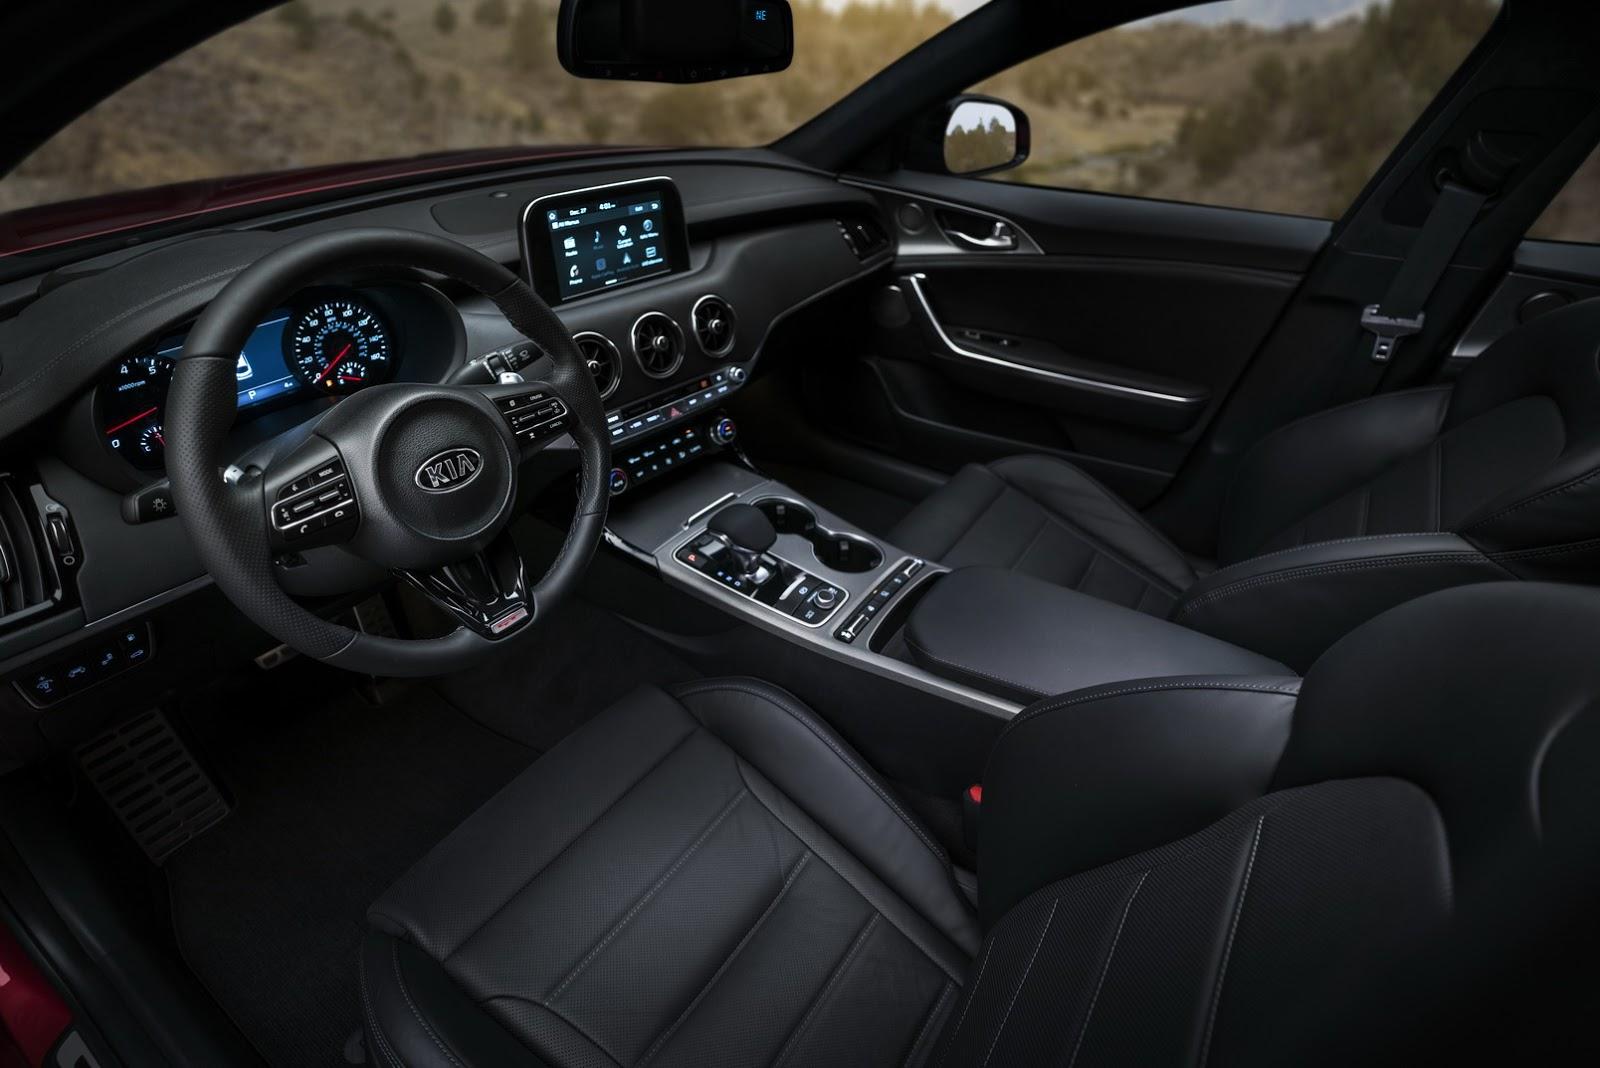 2018 Kia Stinger GT (13)